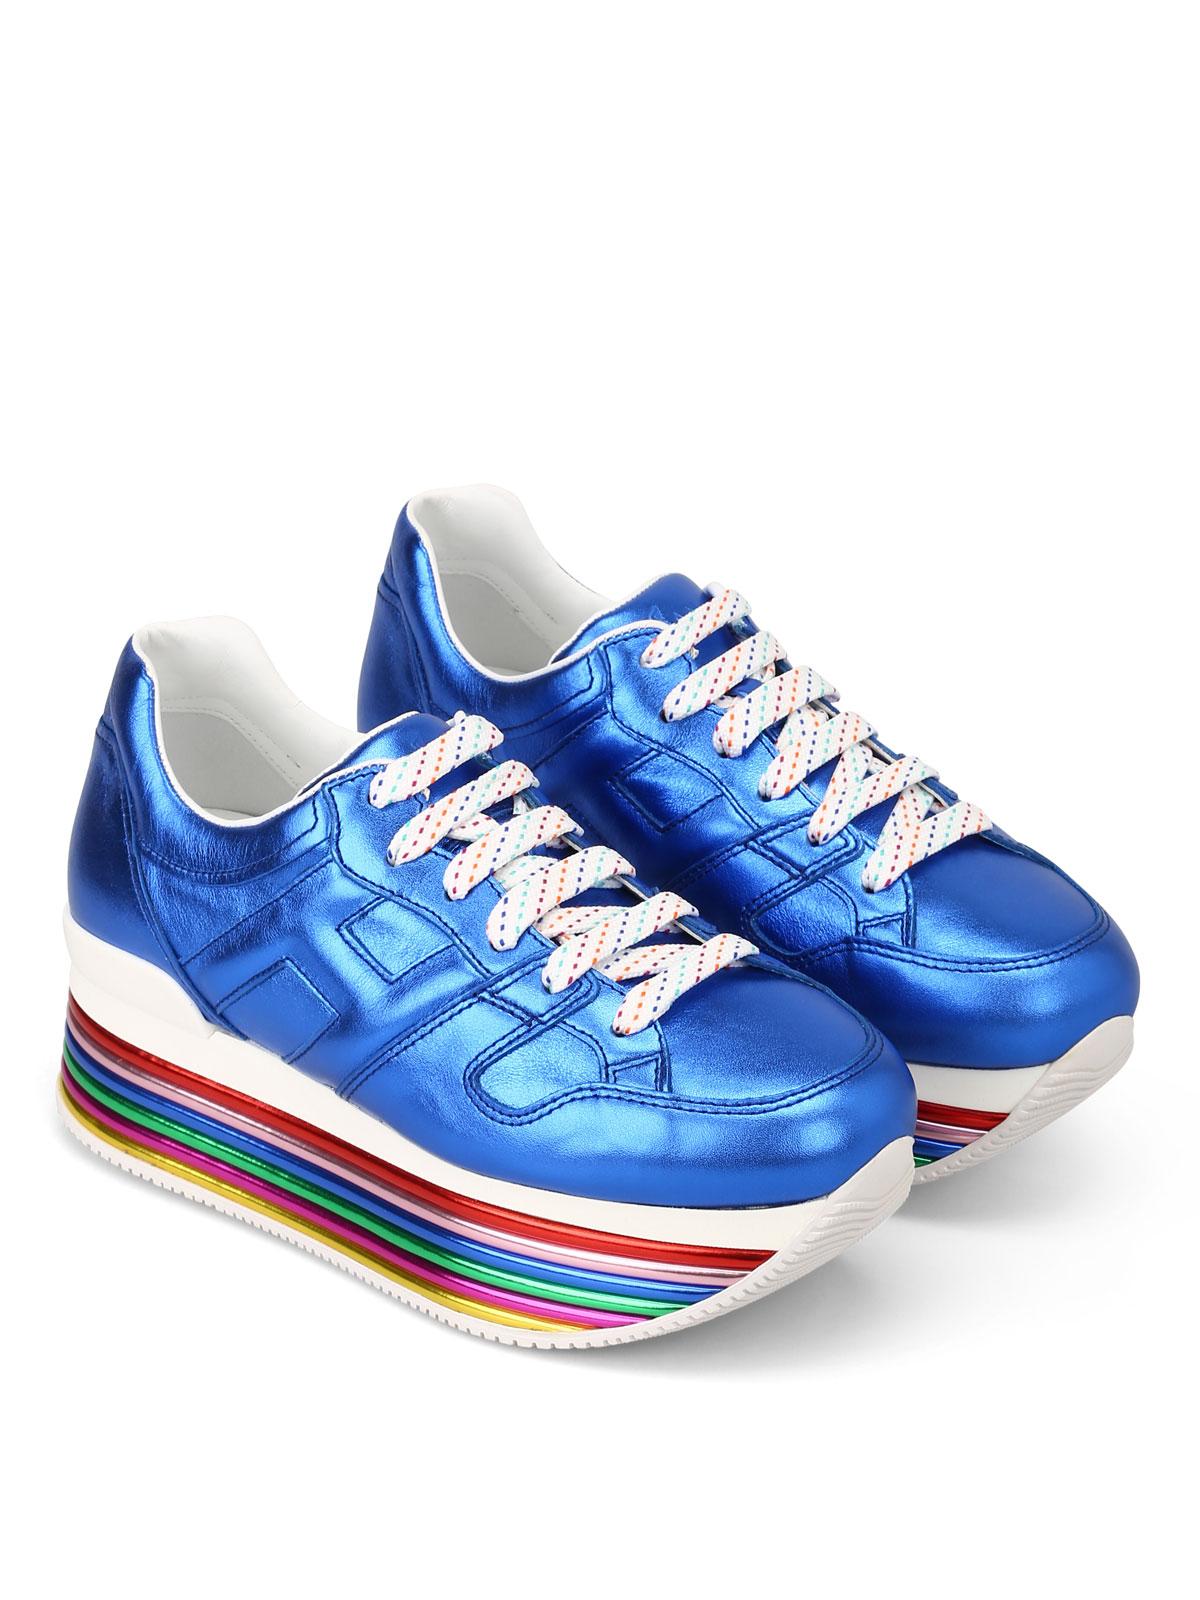 Trainers Hogan - H352 maxi platform sneakers - GYW3520T548SV0U605